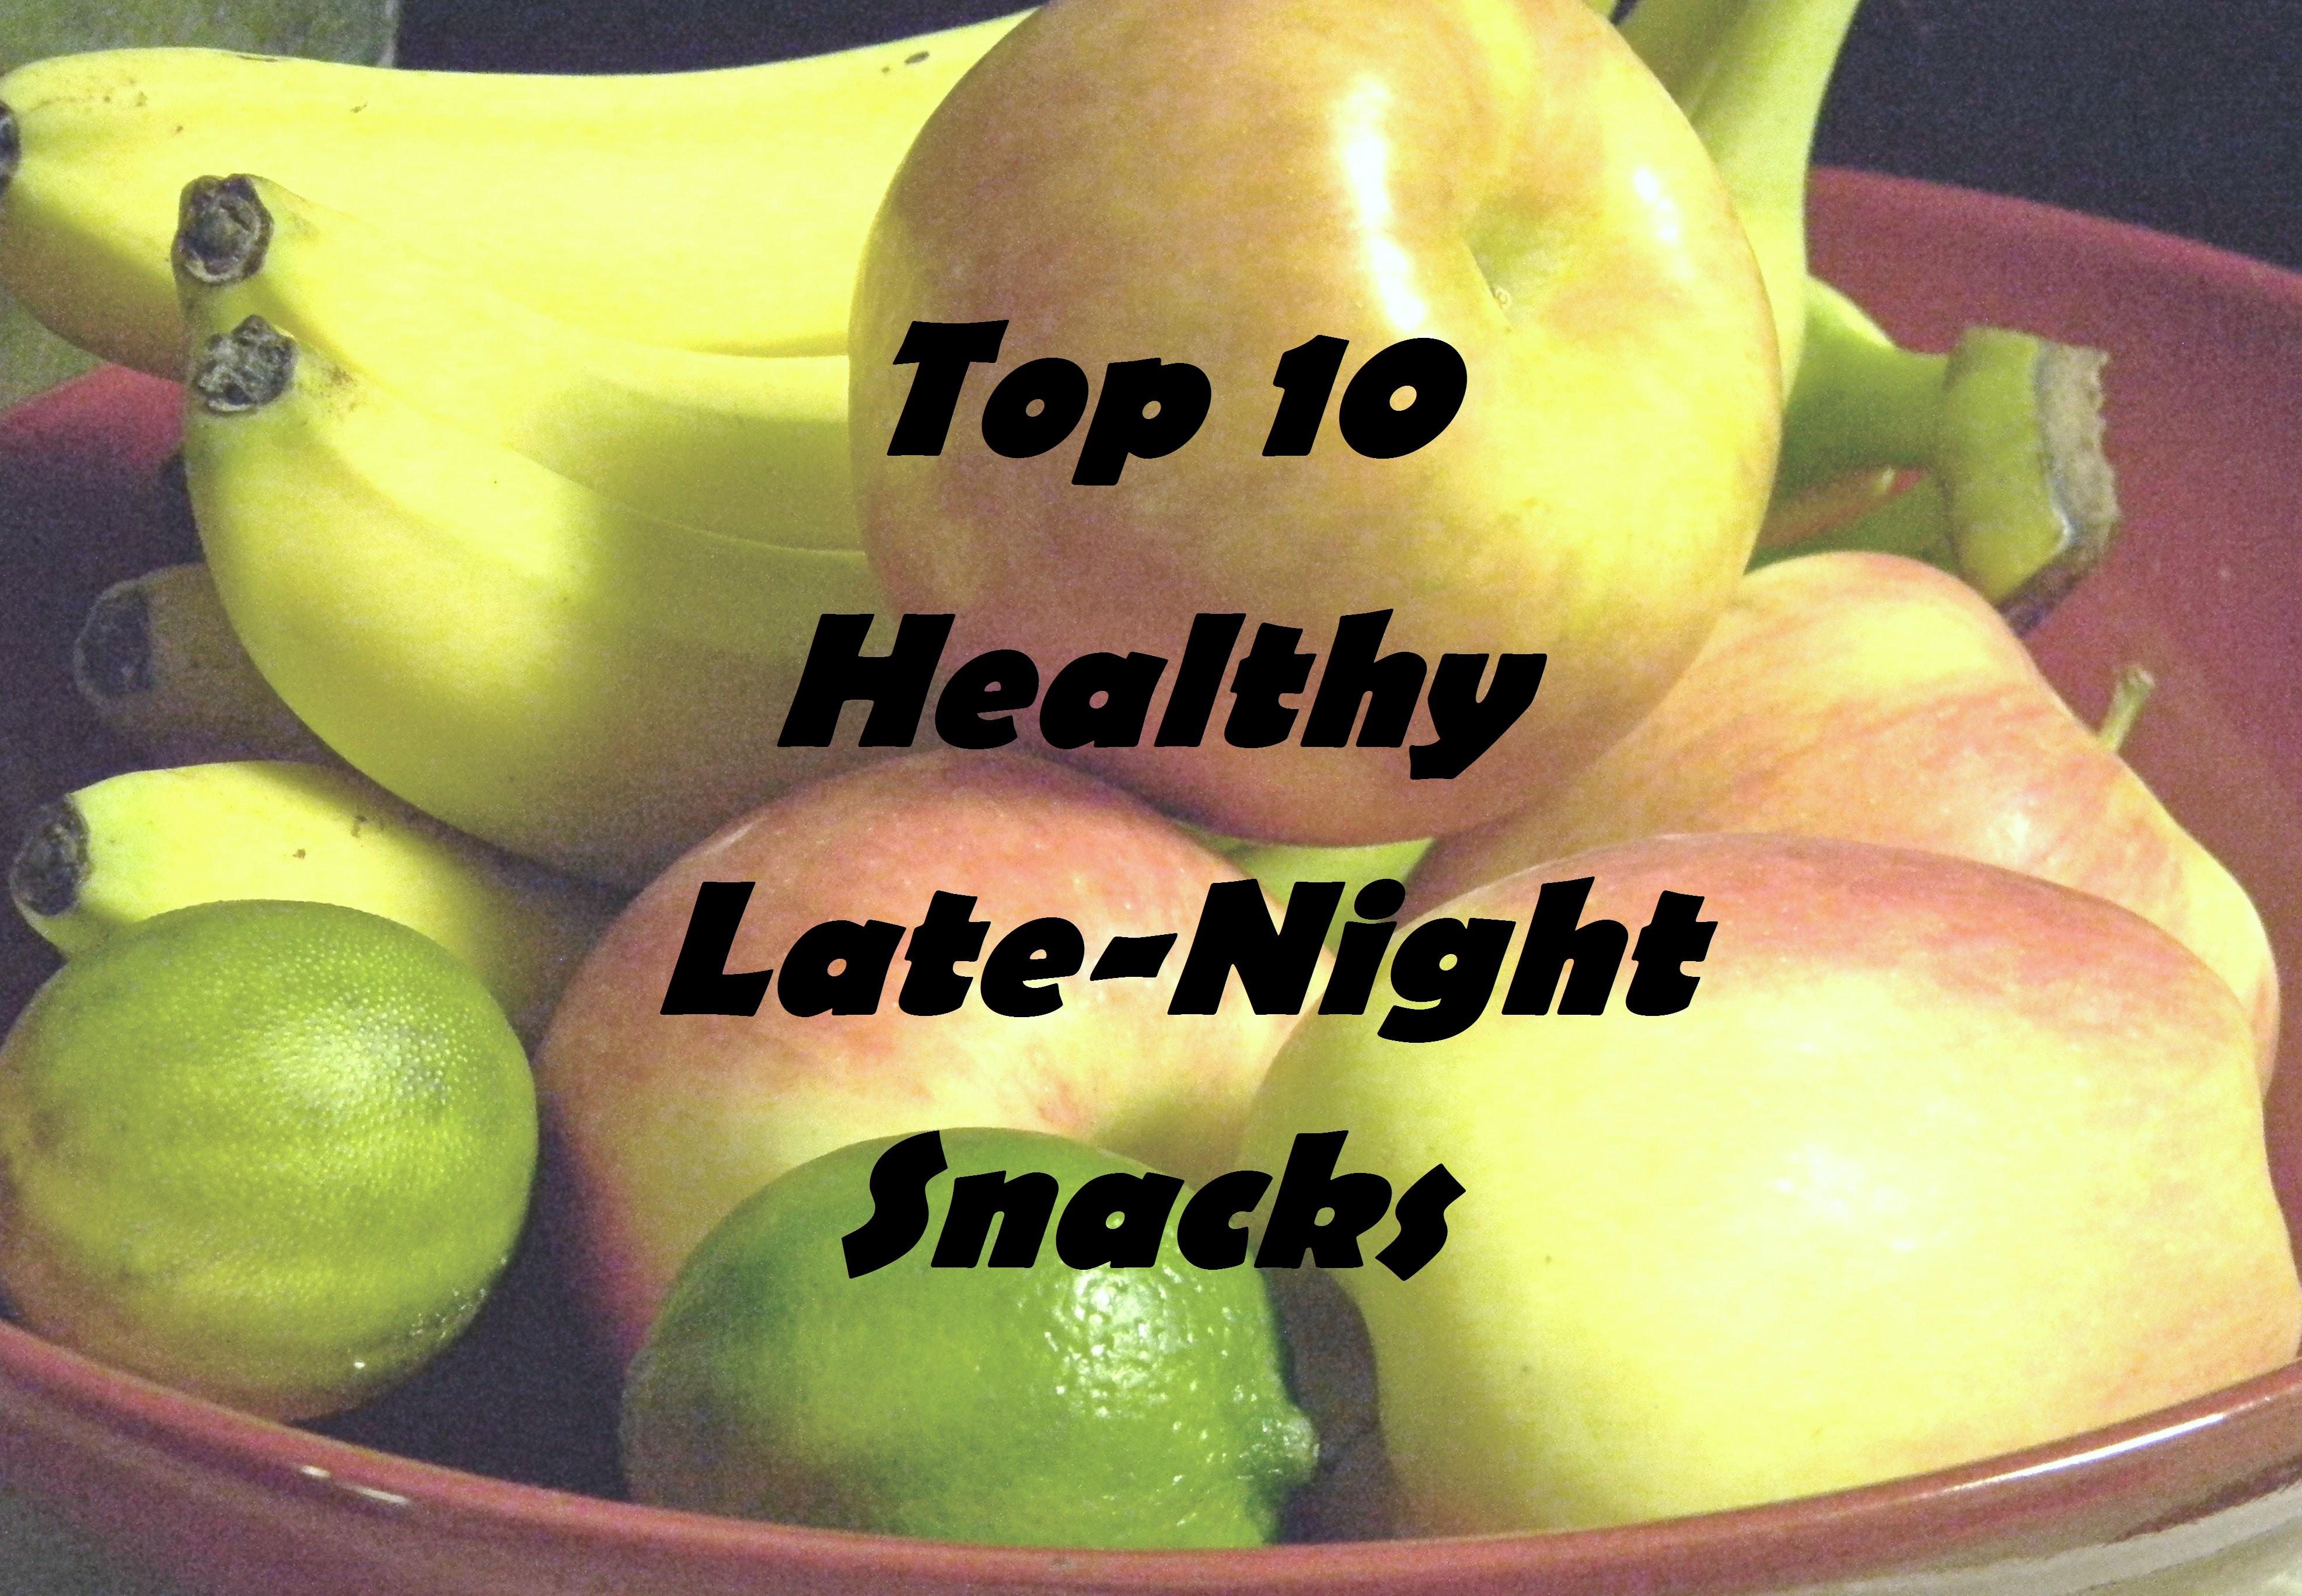 Top 10 Healthy Snacks  Top 10 Healthy Late Night Snacks